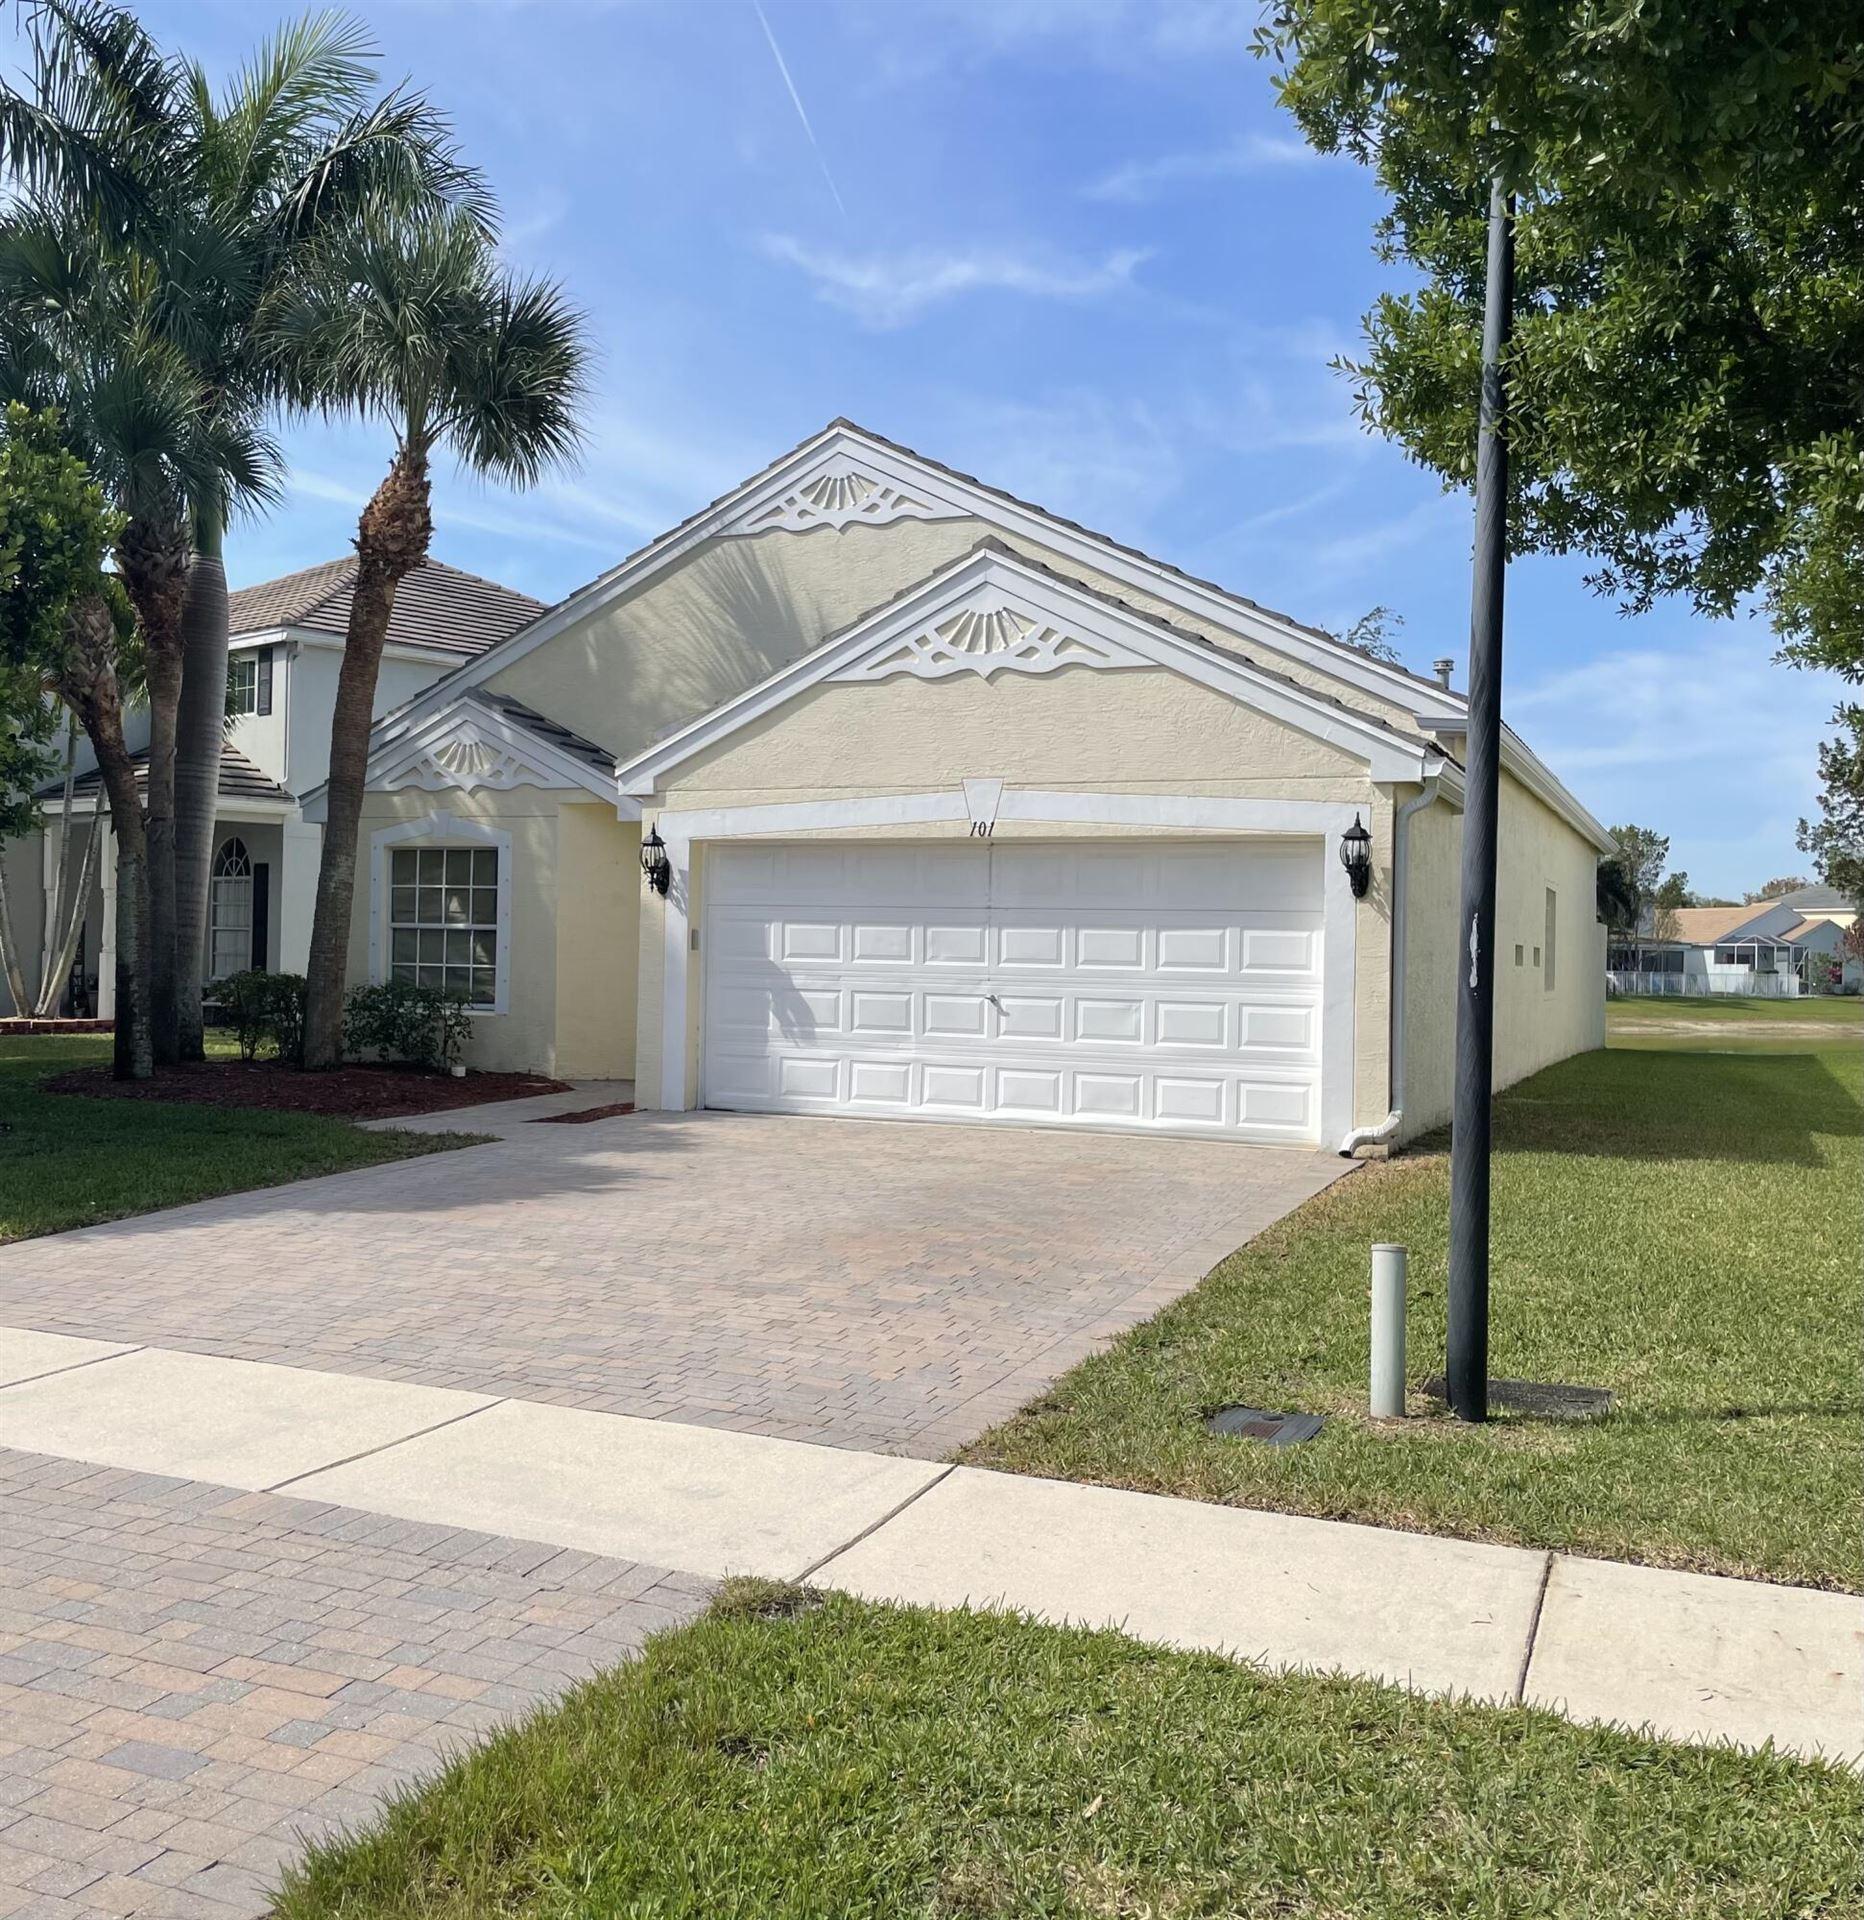 101 Canterbury Place, Royal Palm Beach, FL 33414 - #: RX-10712189